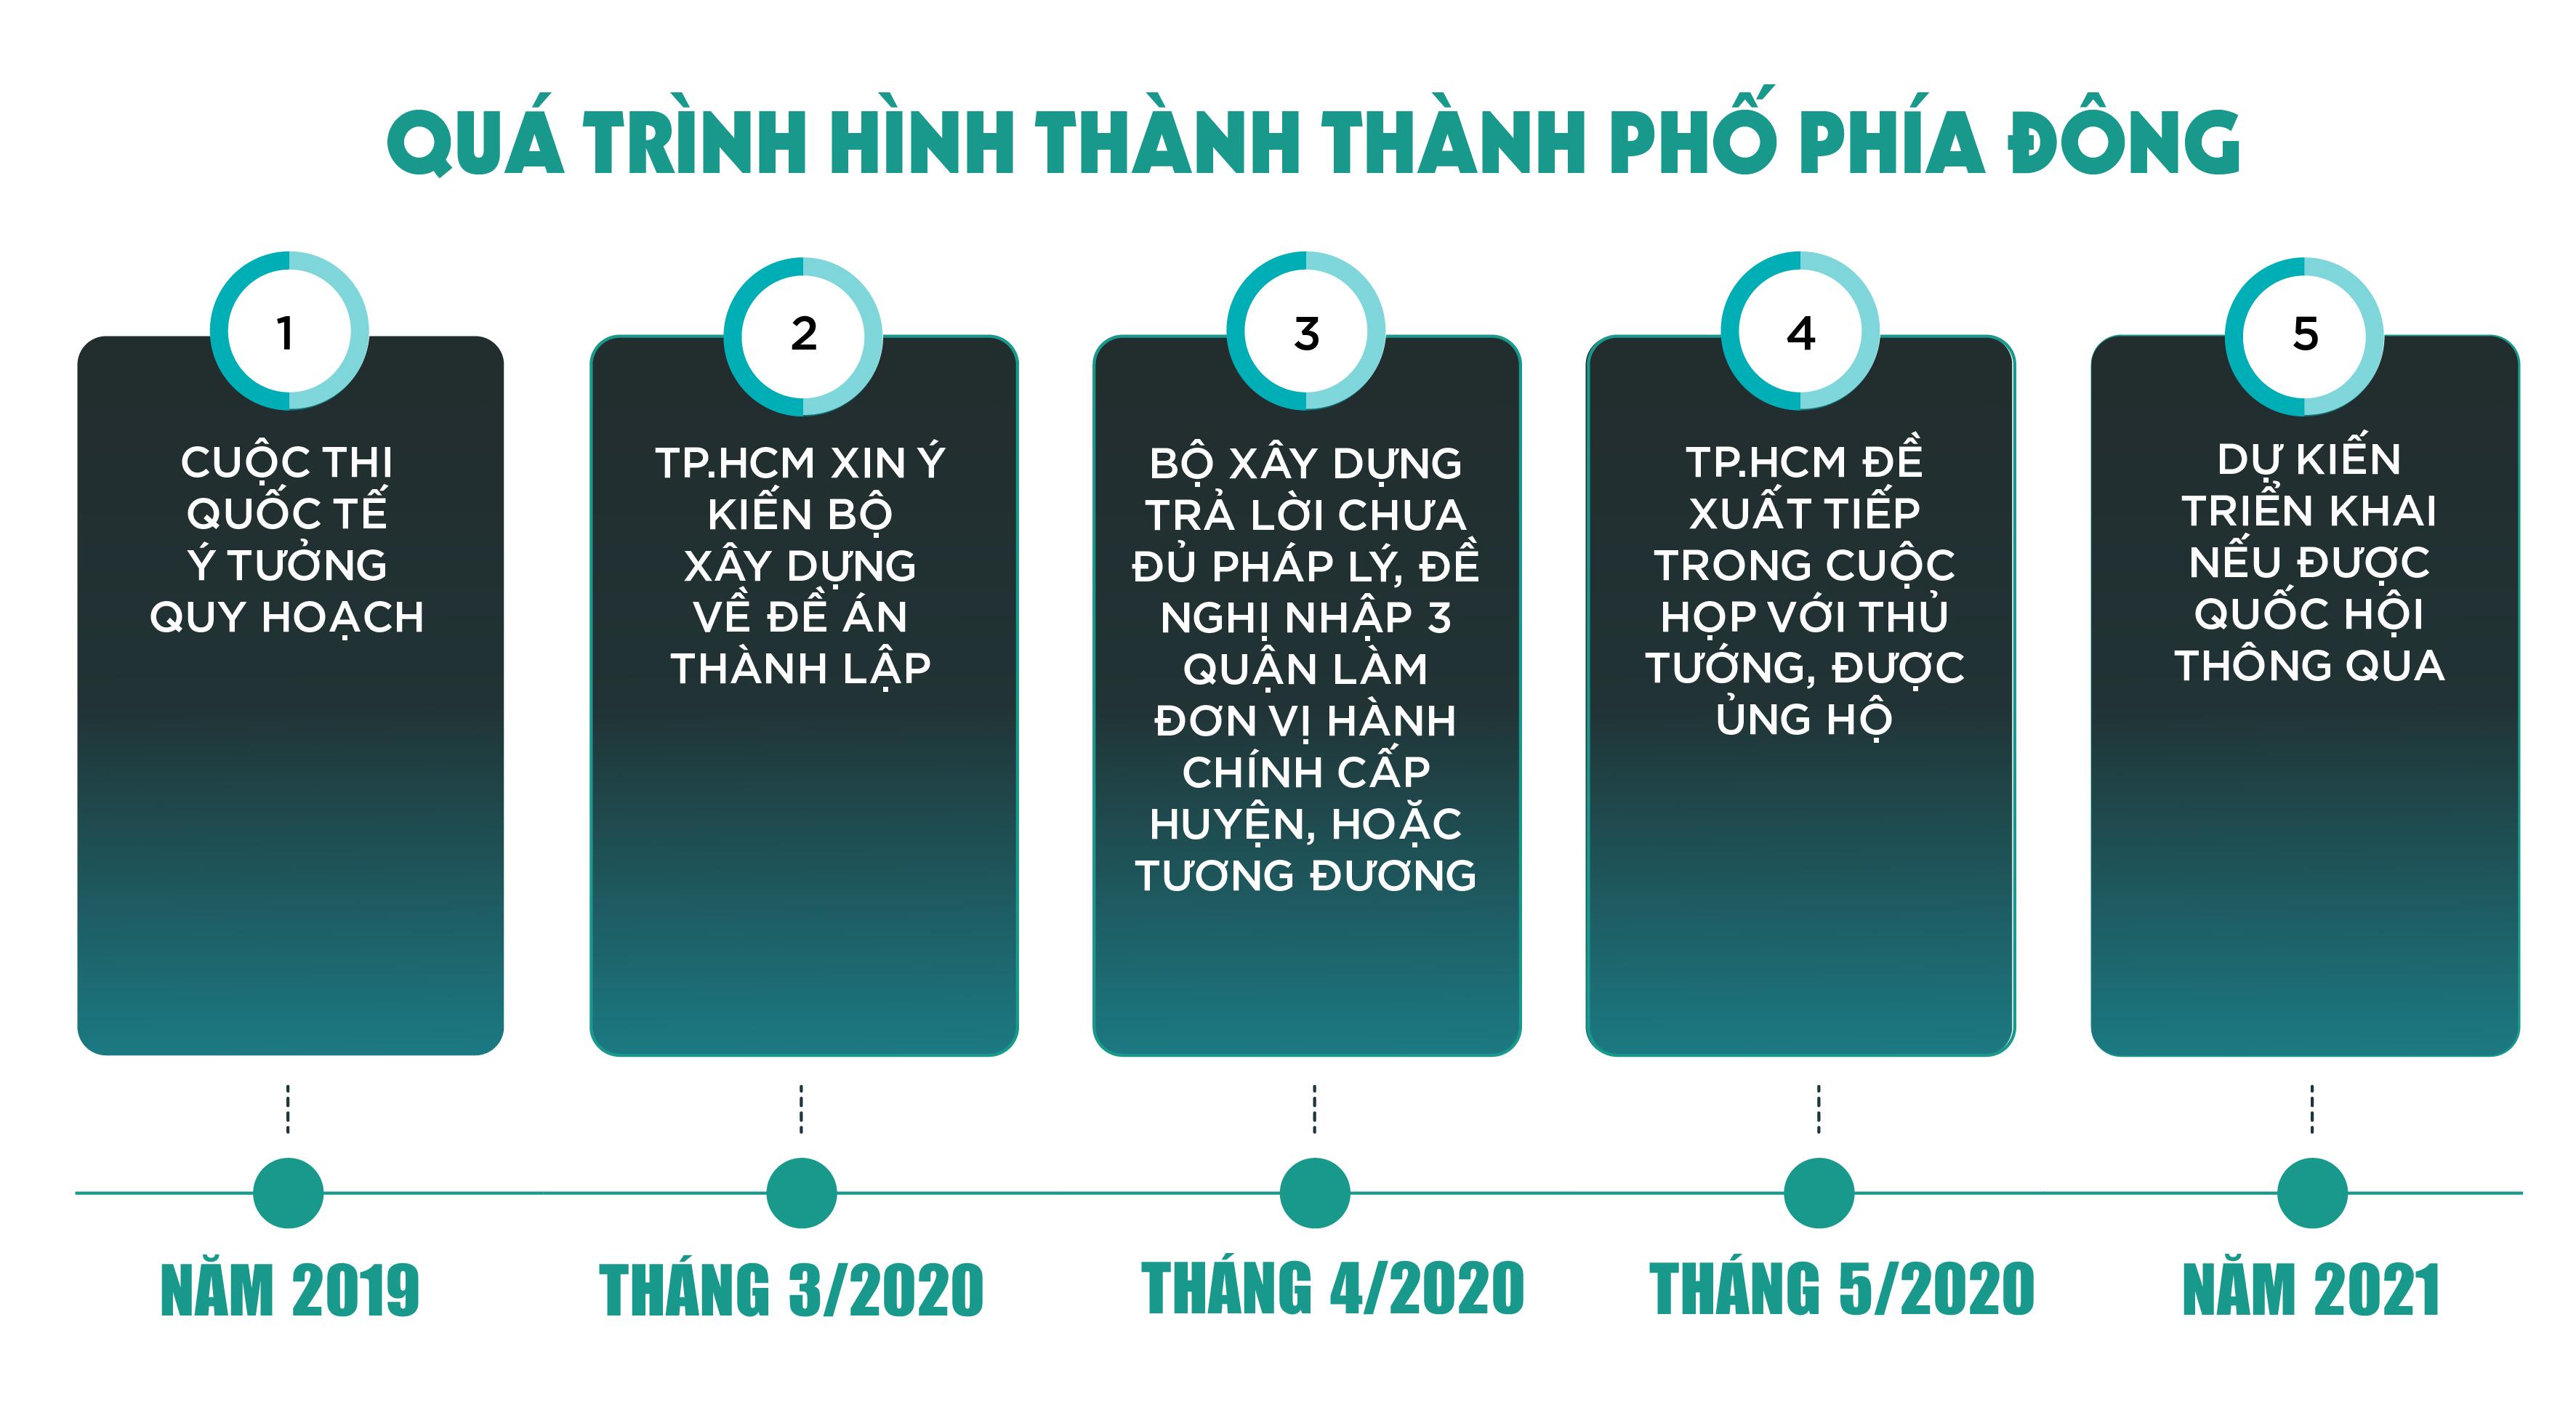 thanh-pho-phia-dong-dai-gon